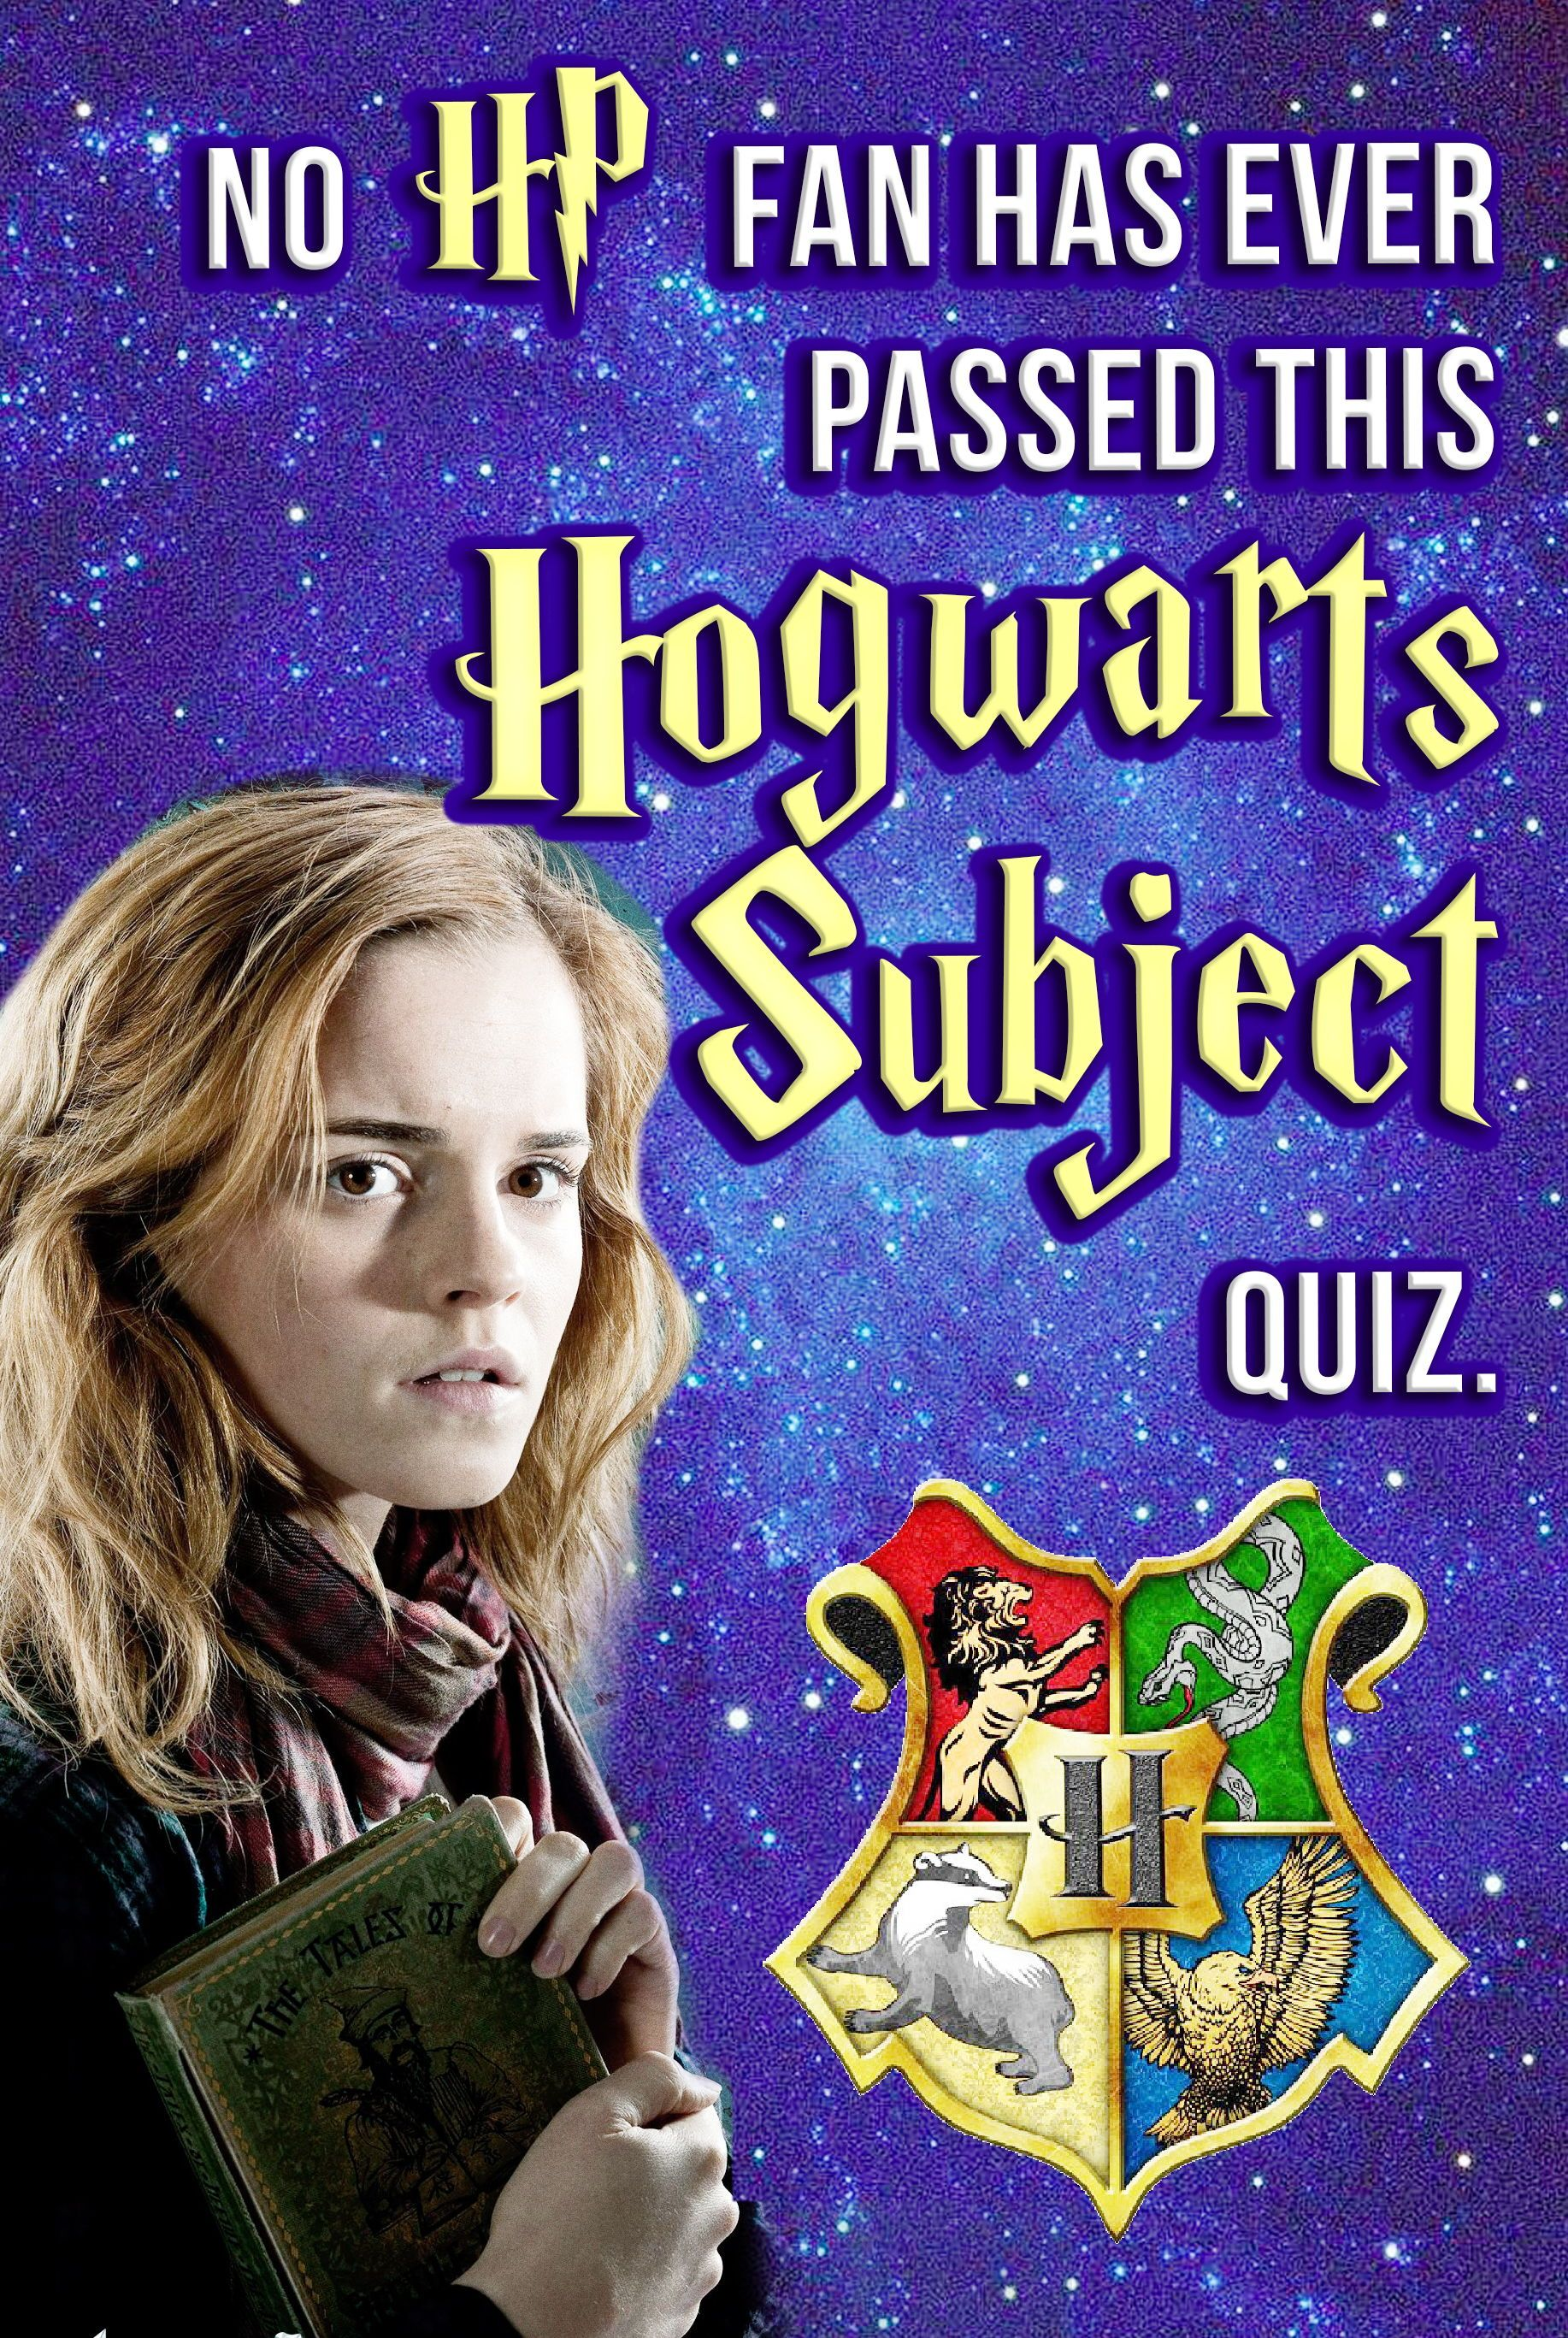 Quiz No Potterhead Has Ever Passed This Hogwarts Subject Quiz Can You Harry Potter Quizzes Harry Potter Zodiac Hogwarts Quiz